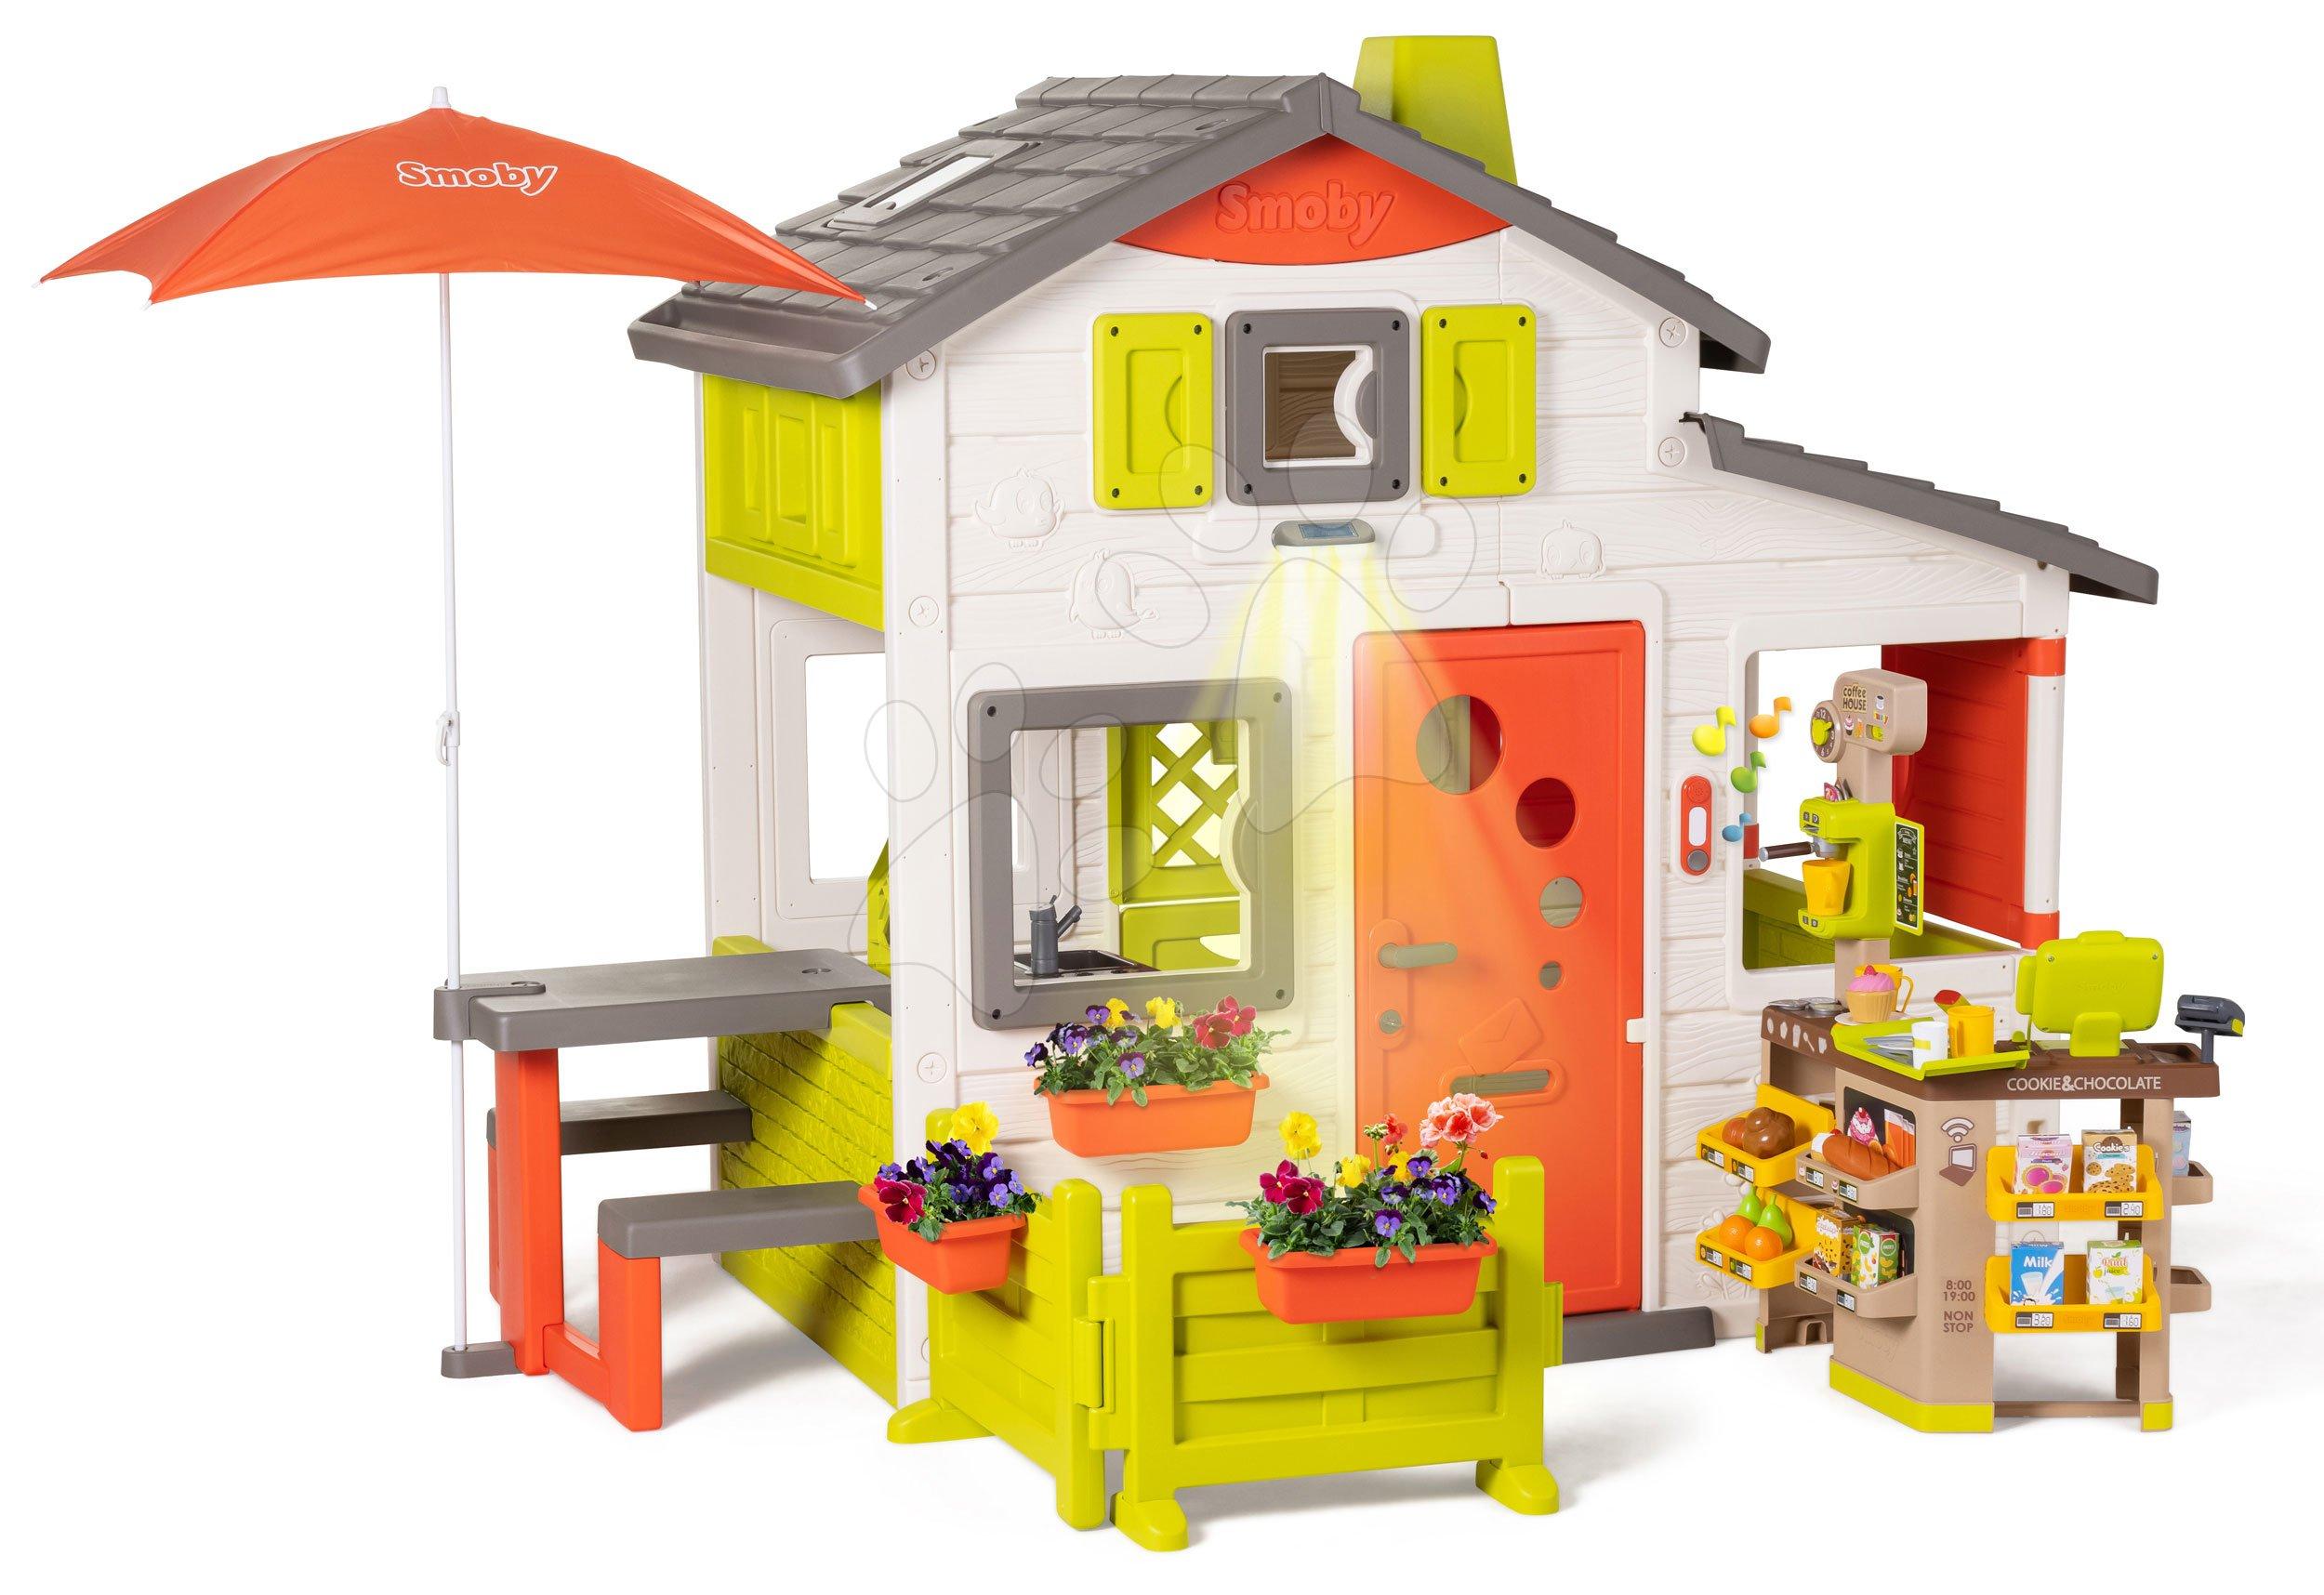 Domček Neo Friends House DeLuxe Smoby s Bio kaviarňou a kuchynkou na rohu ulice SM810211-R